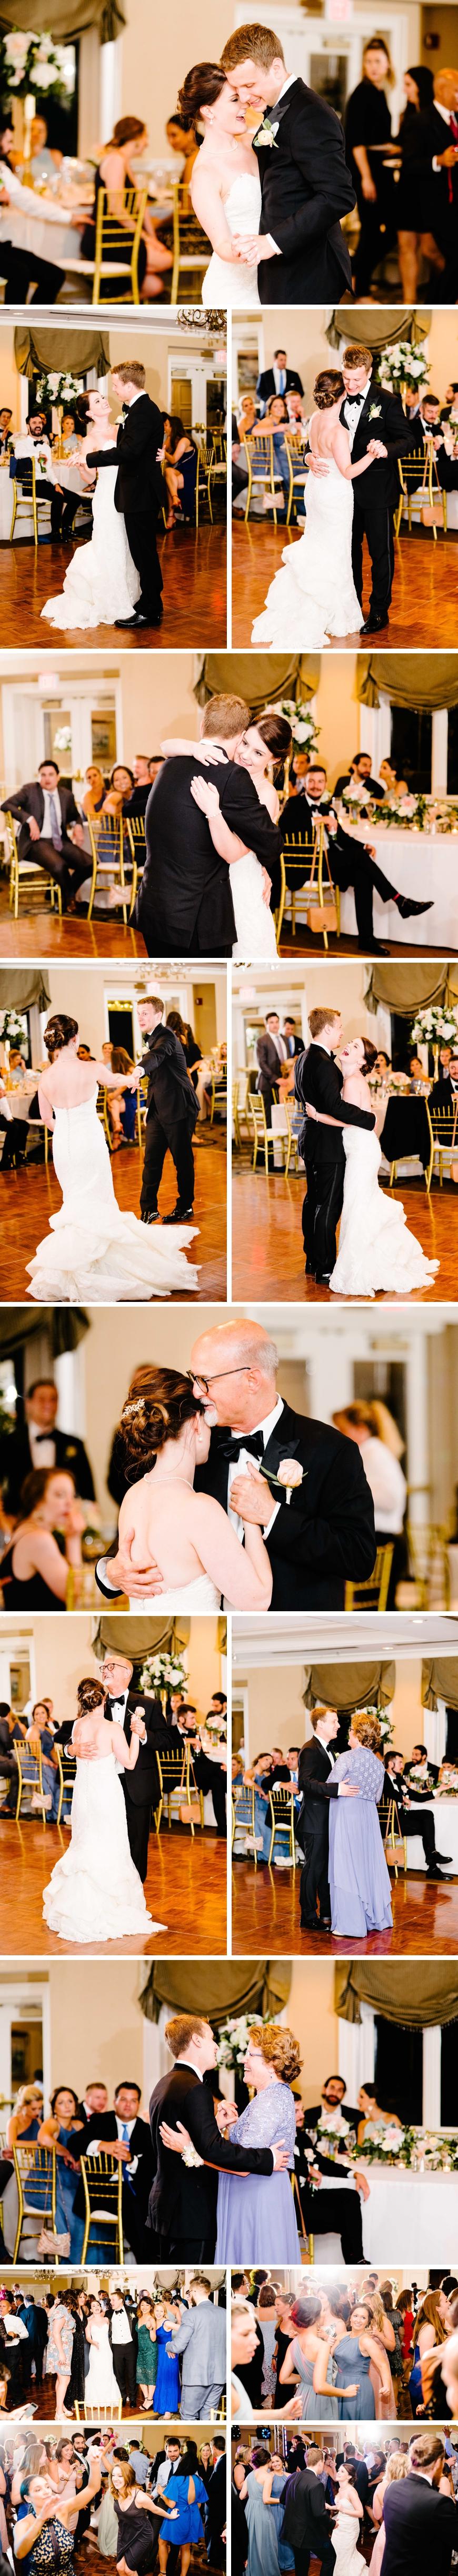 chicago-fine-art-wedding-photography-kinn70